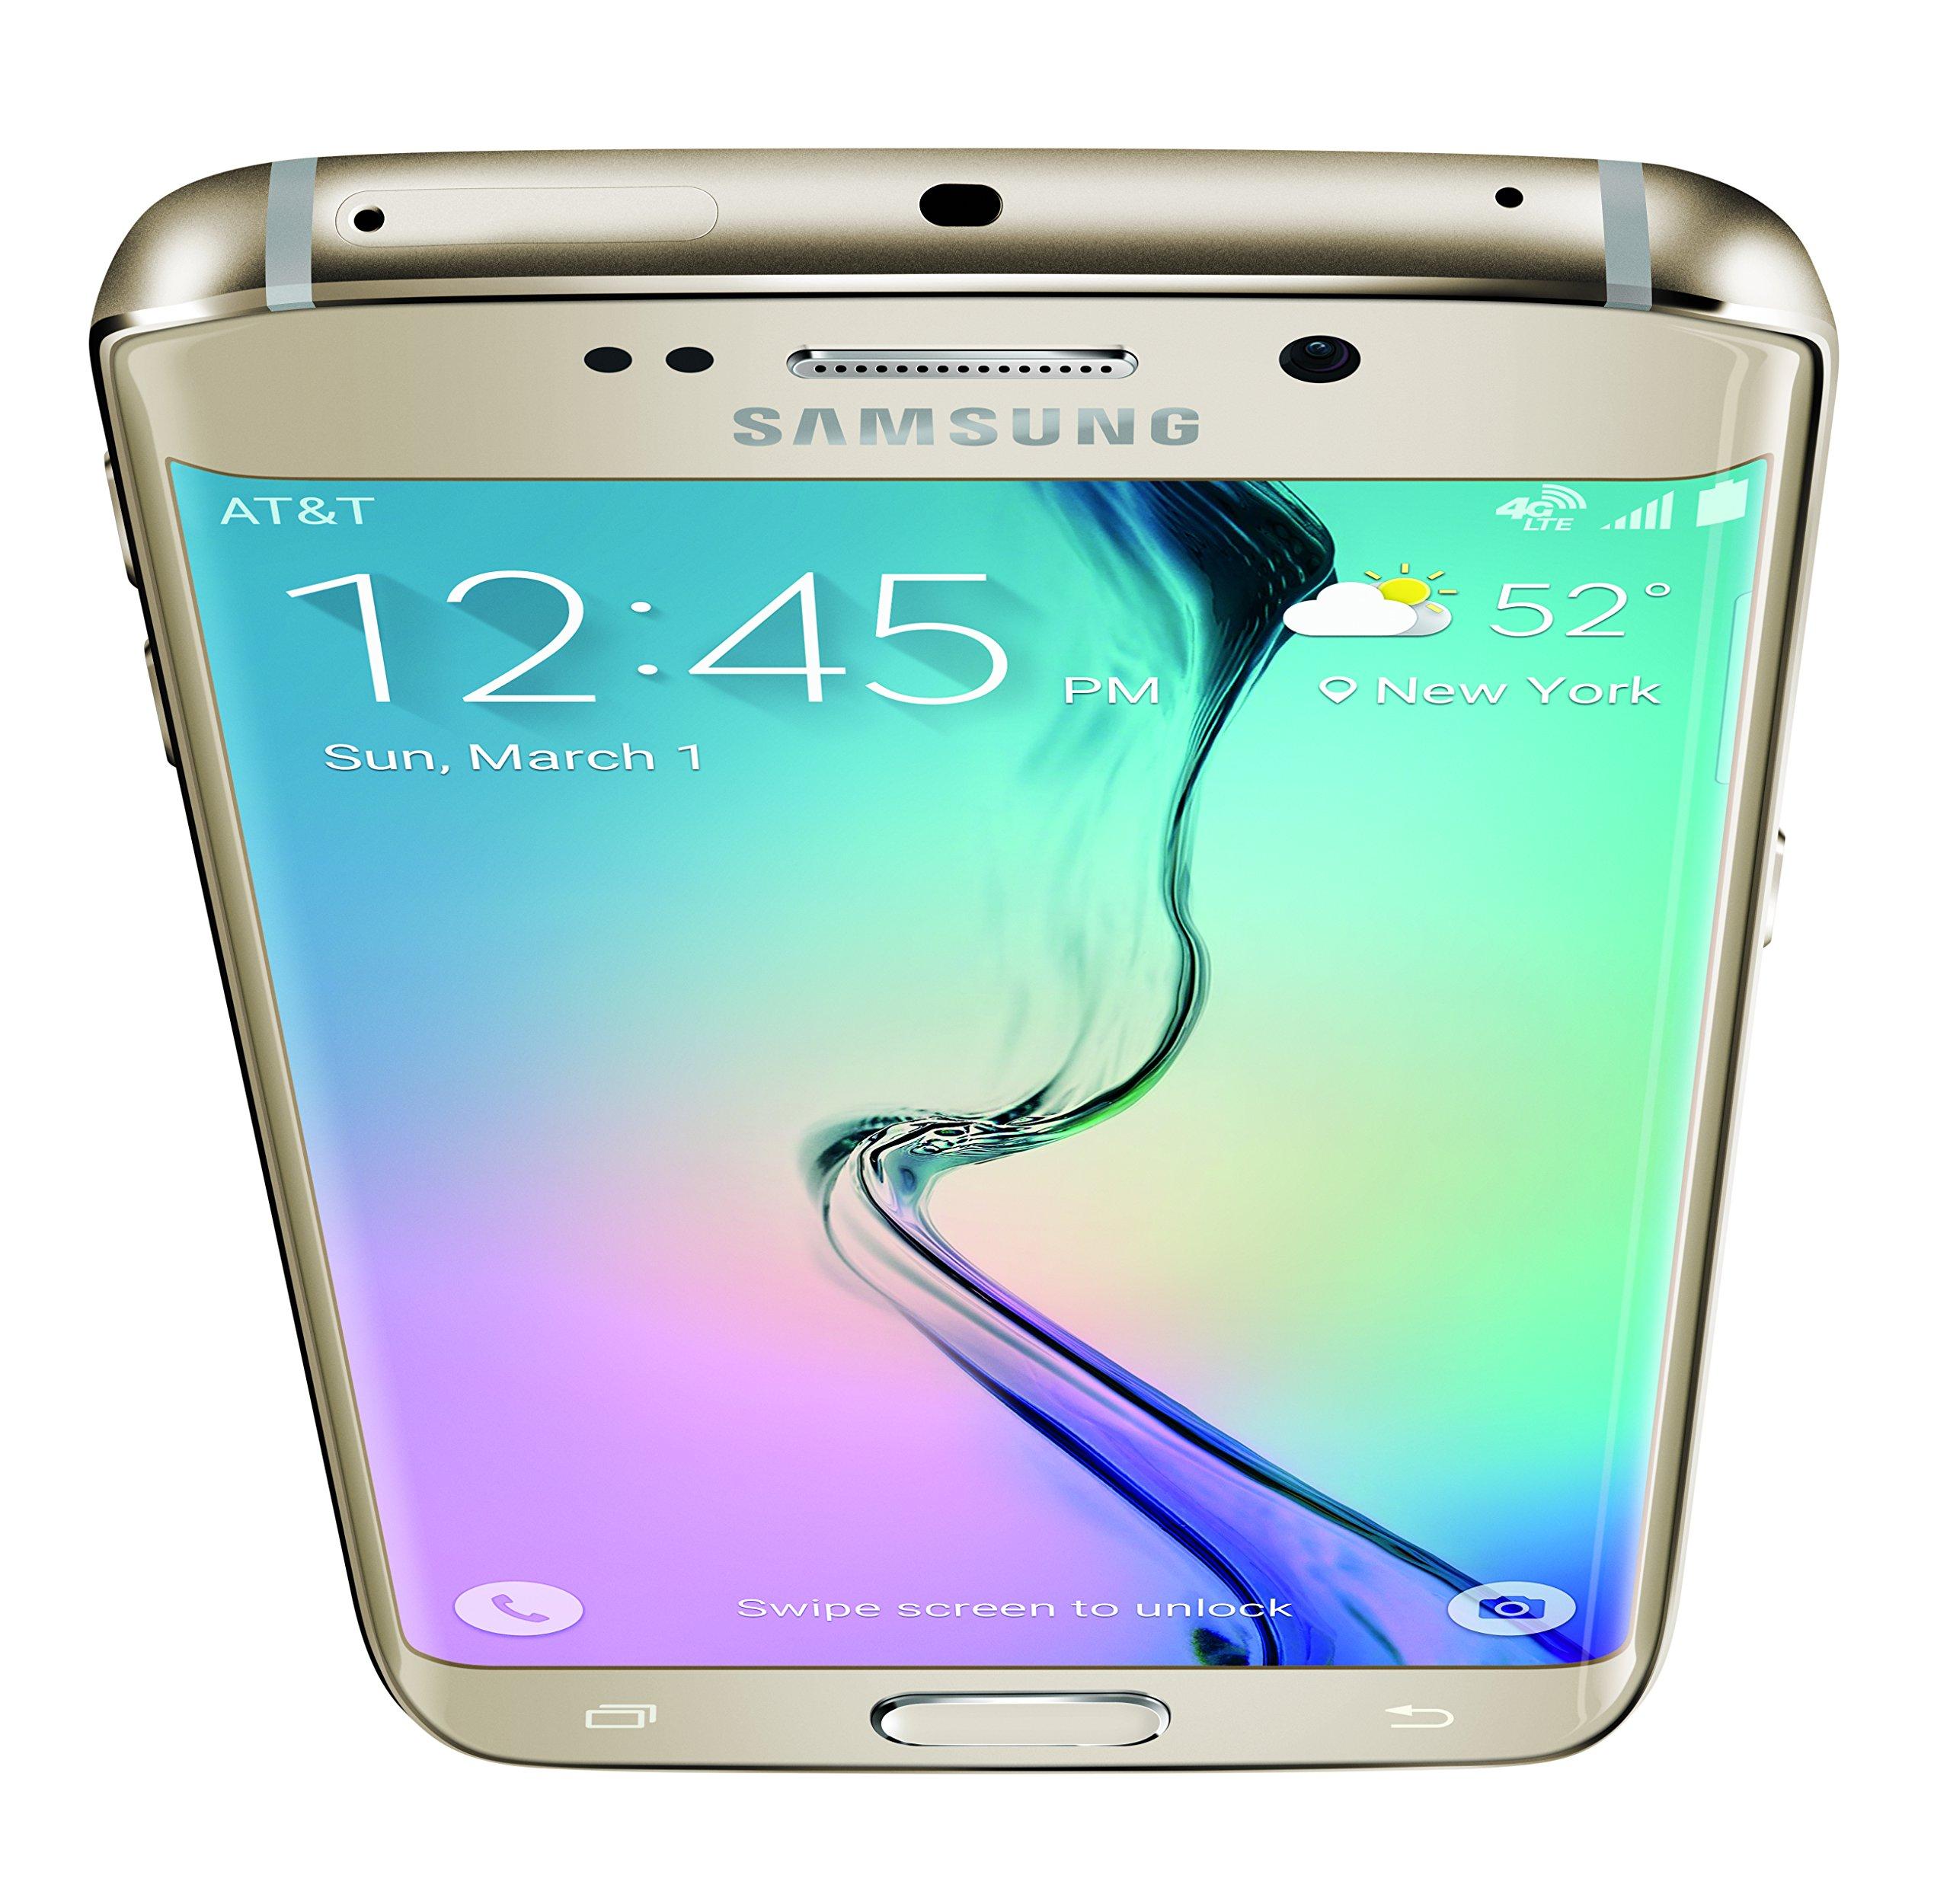 Samsunf Platinum: Samsung Galaxy S6 Edge, Gold Platinum 64GB (AT&T)